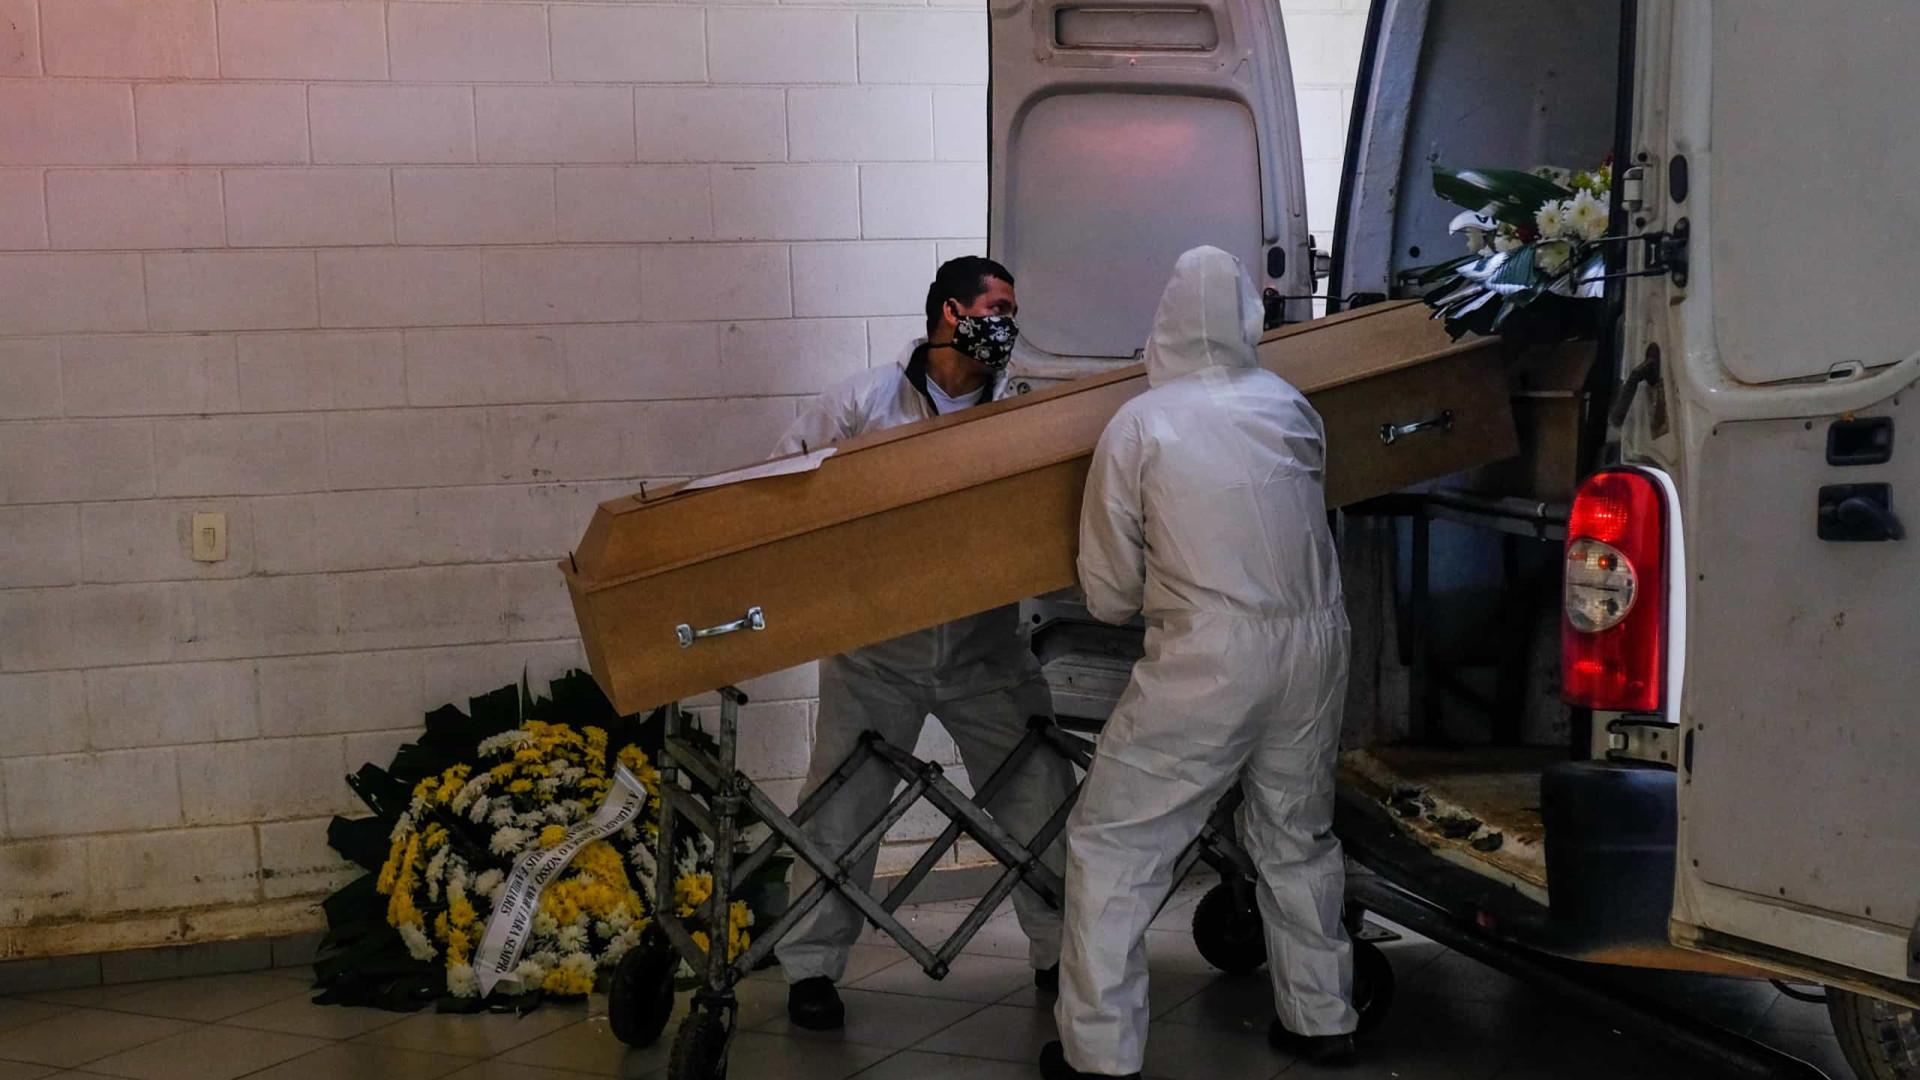 Brasil já soma ao menos 9 prefeitos mortos pelo novo coronavírus